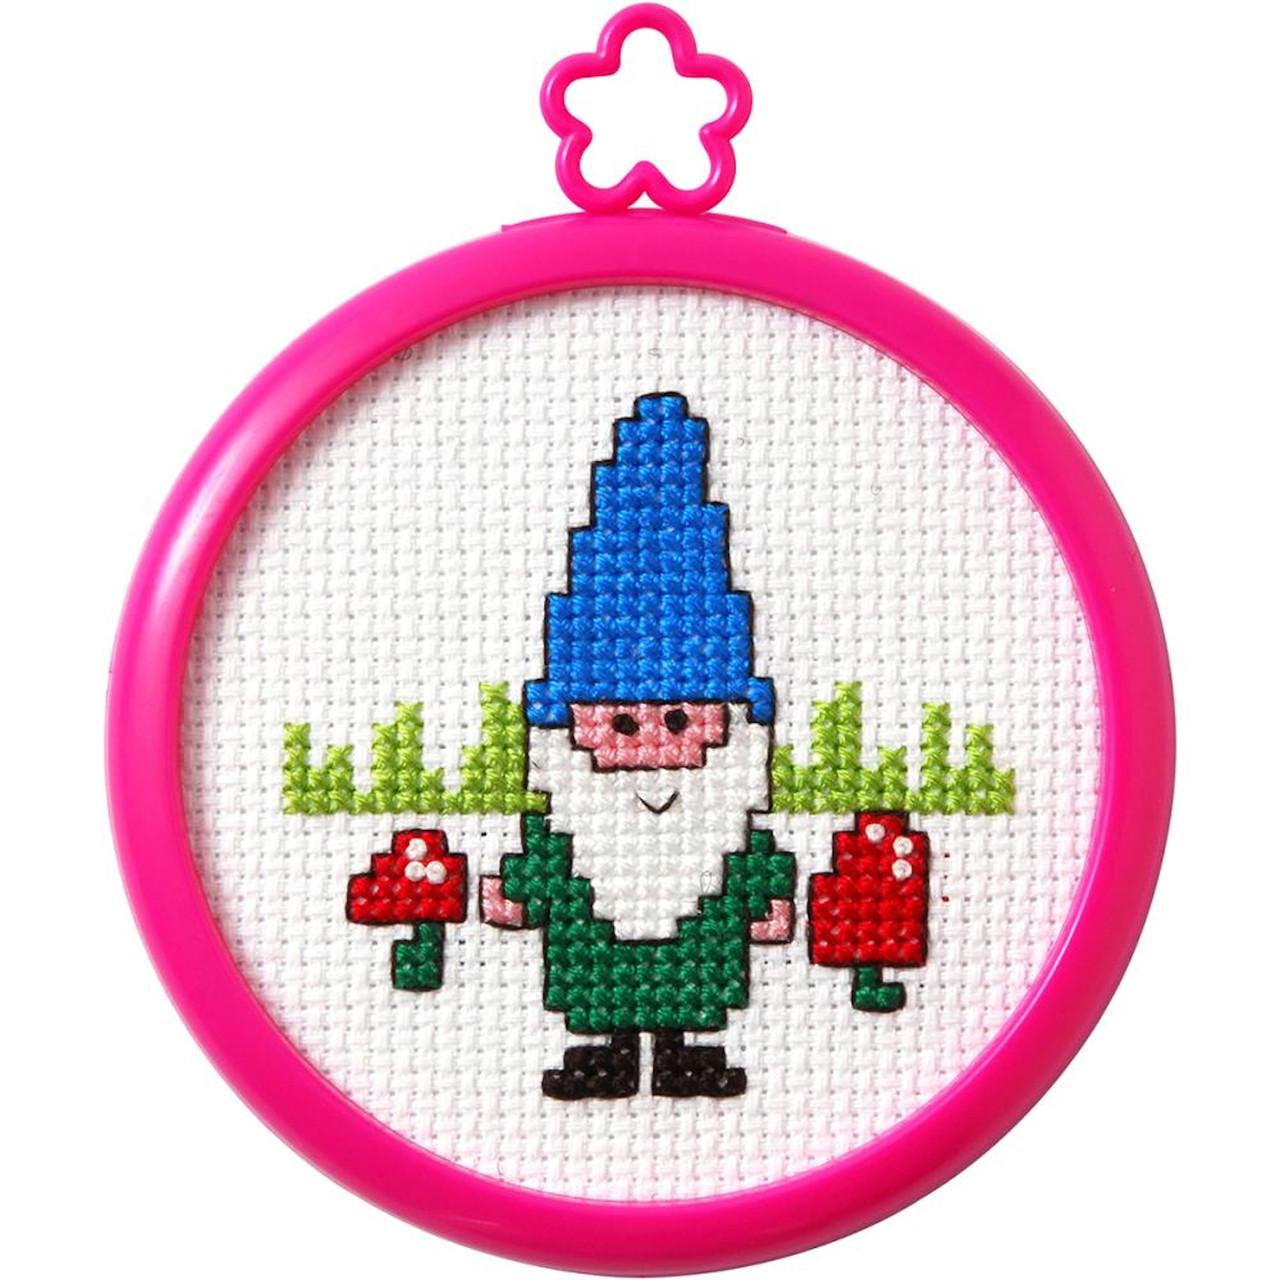 Plaid / Bucilla - My 1st Stitch - Gnome